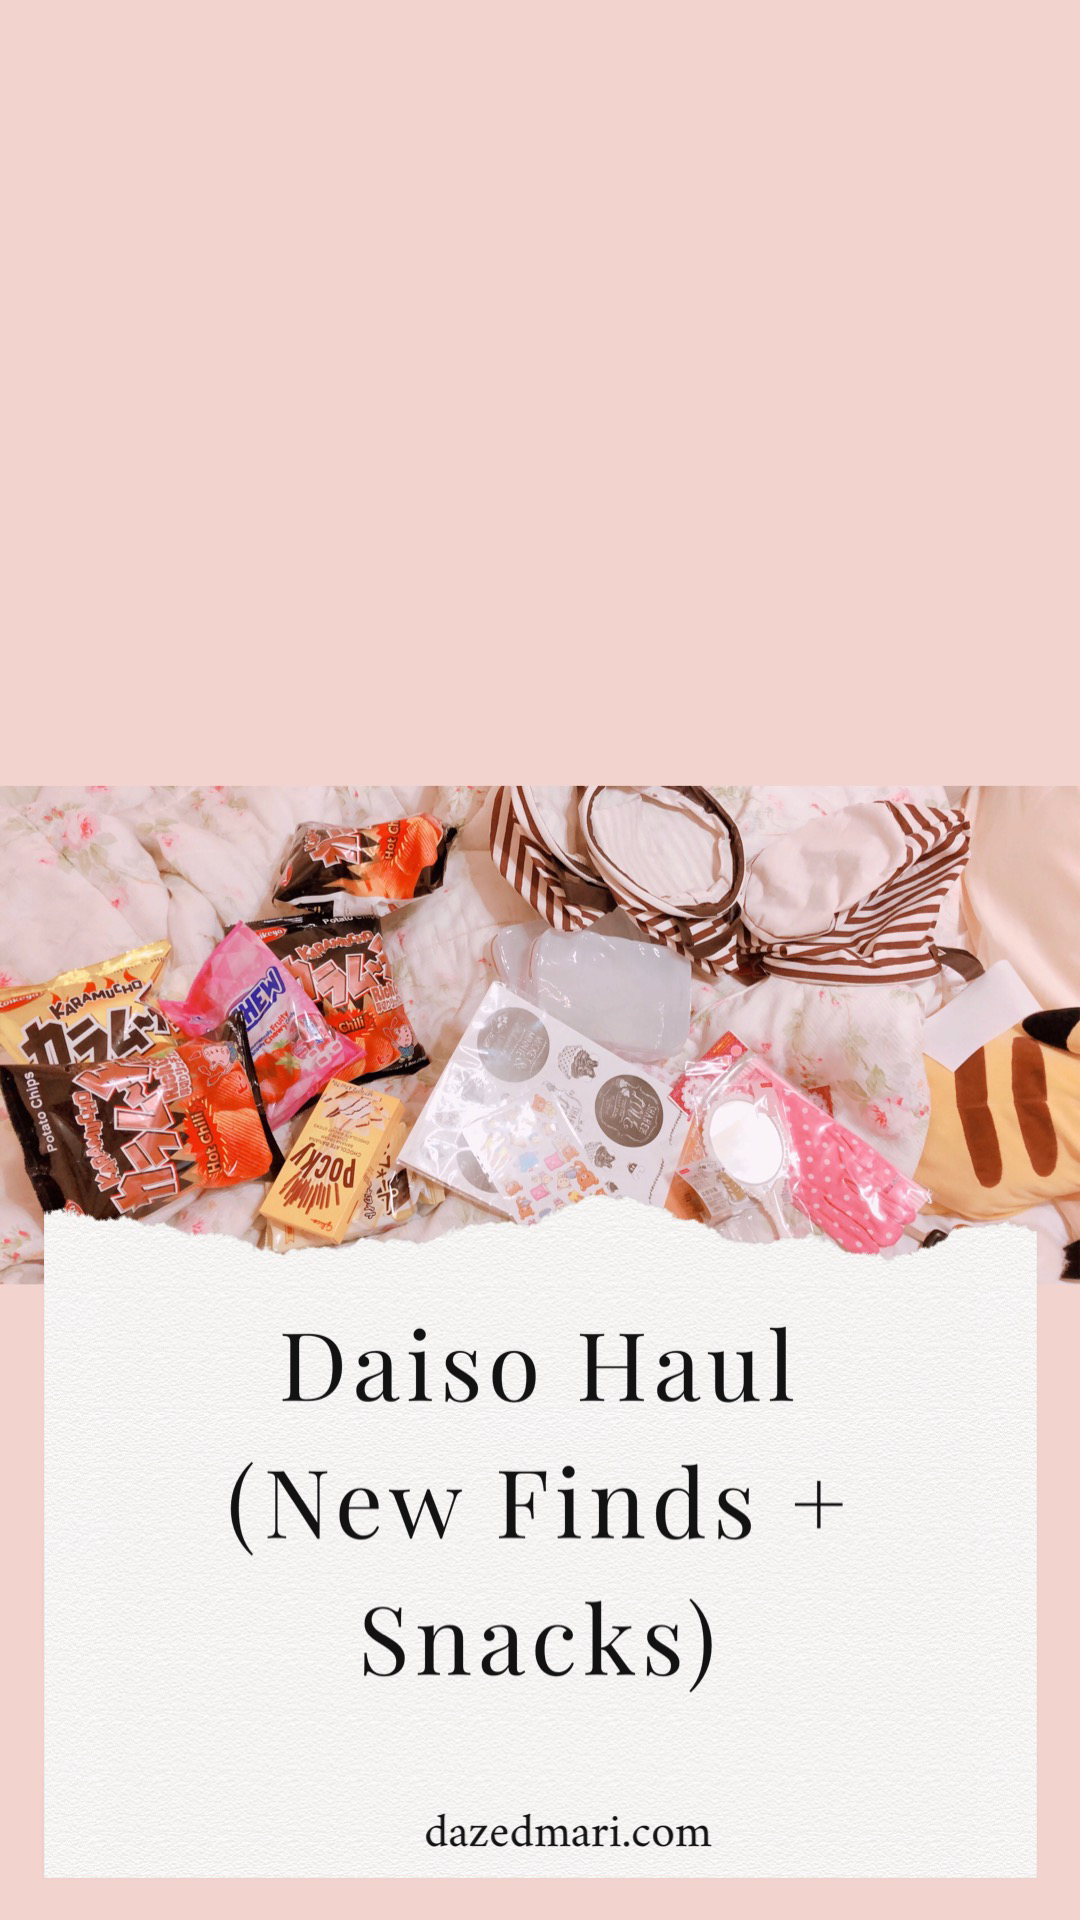 Favorites, Daiso, Daiso haul, Snacks